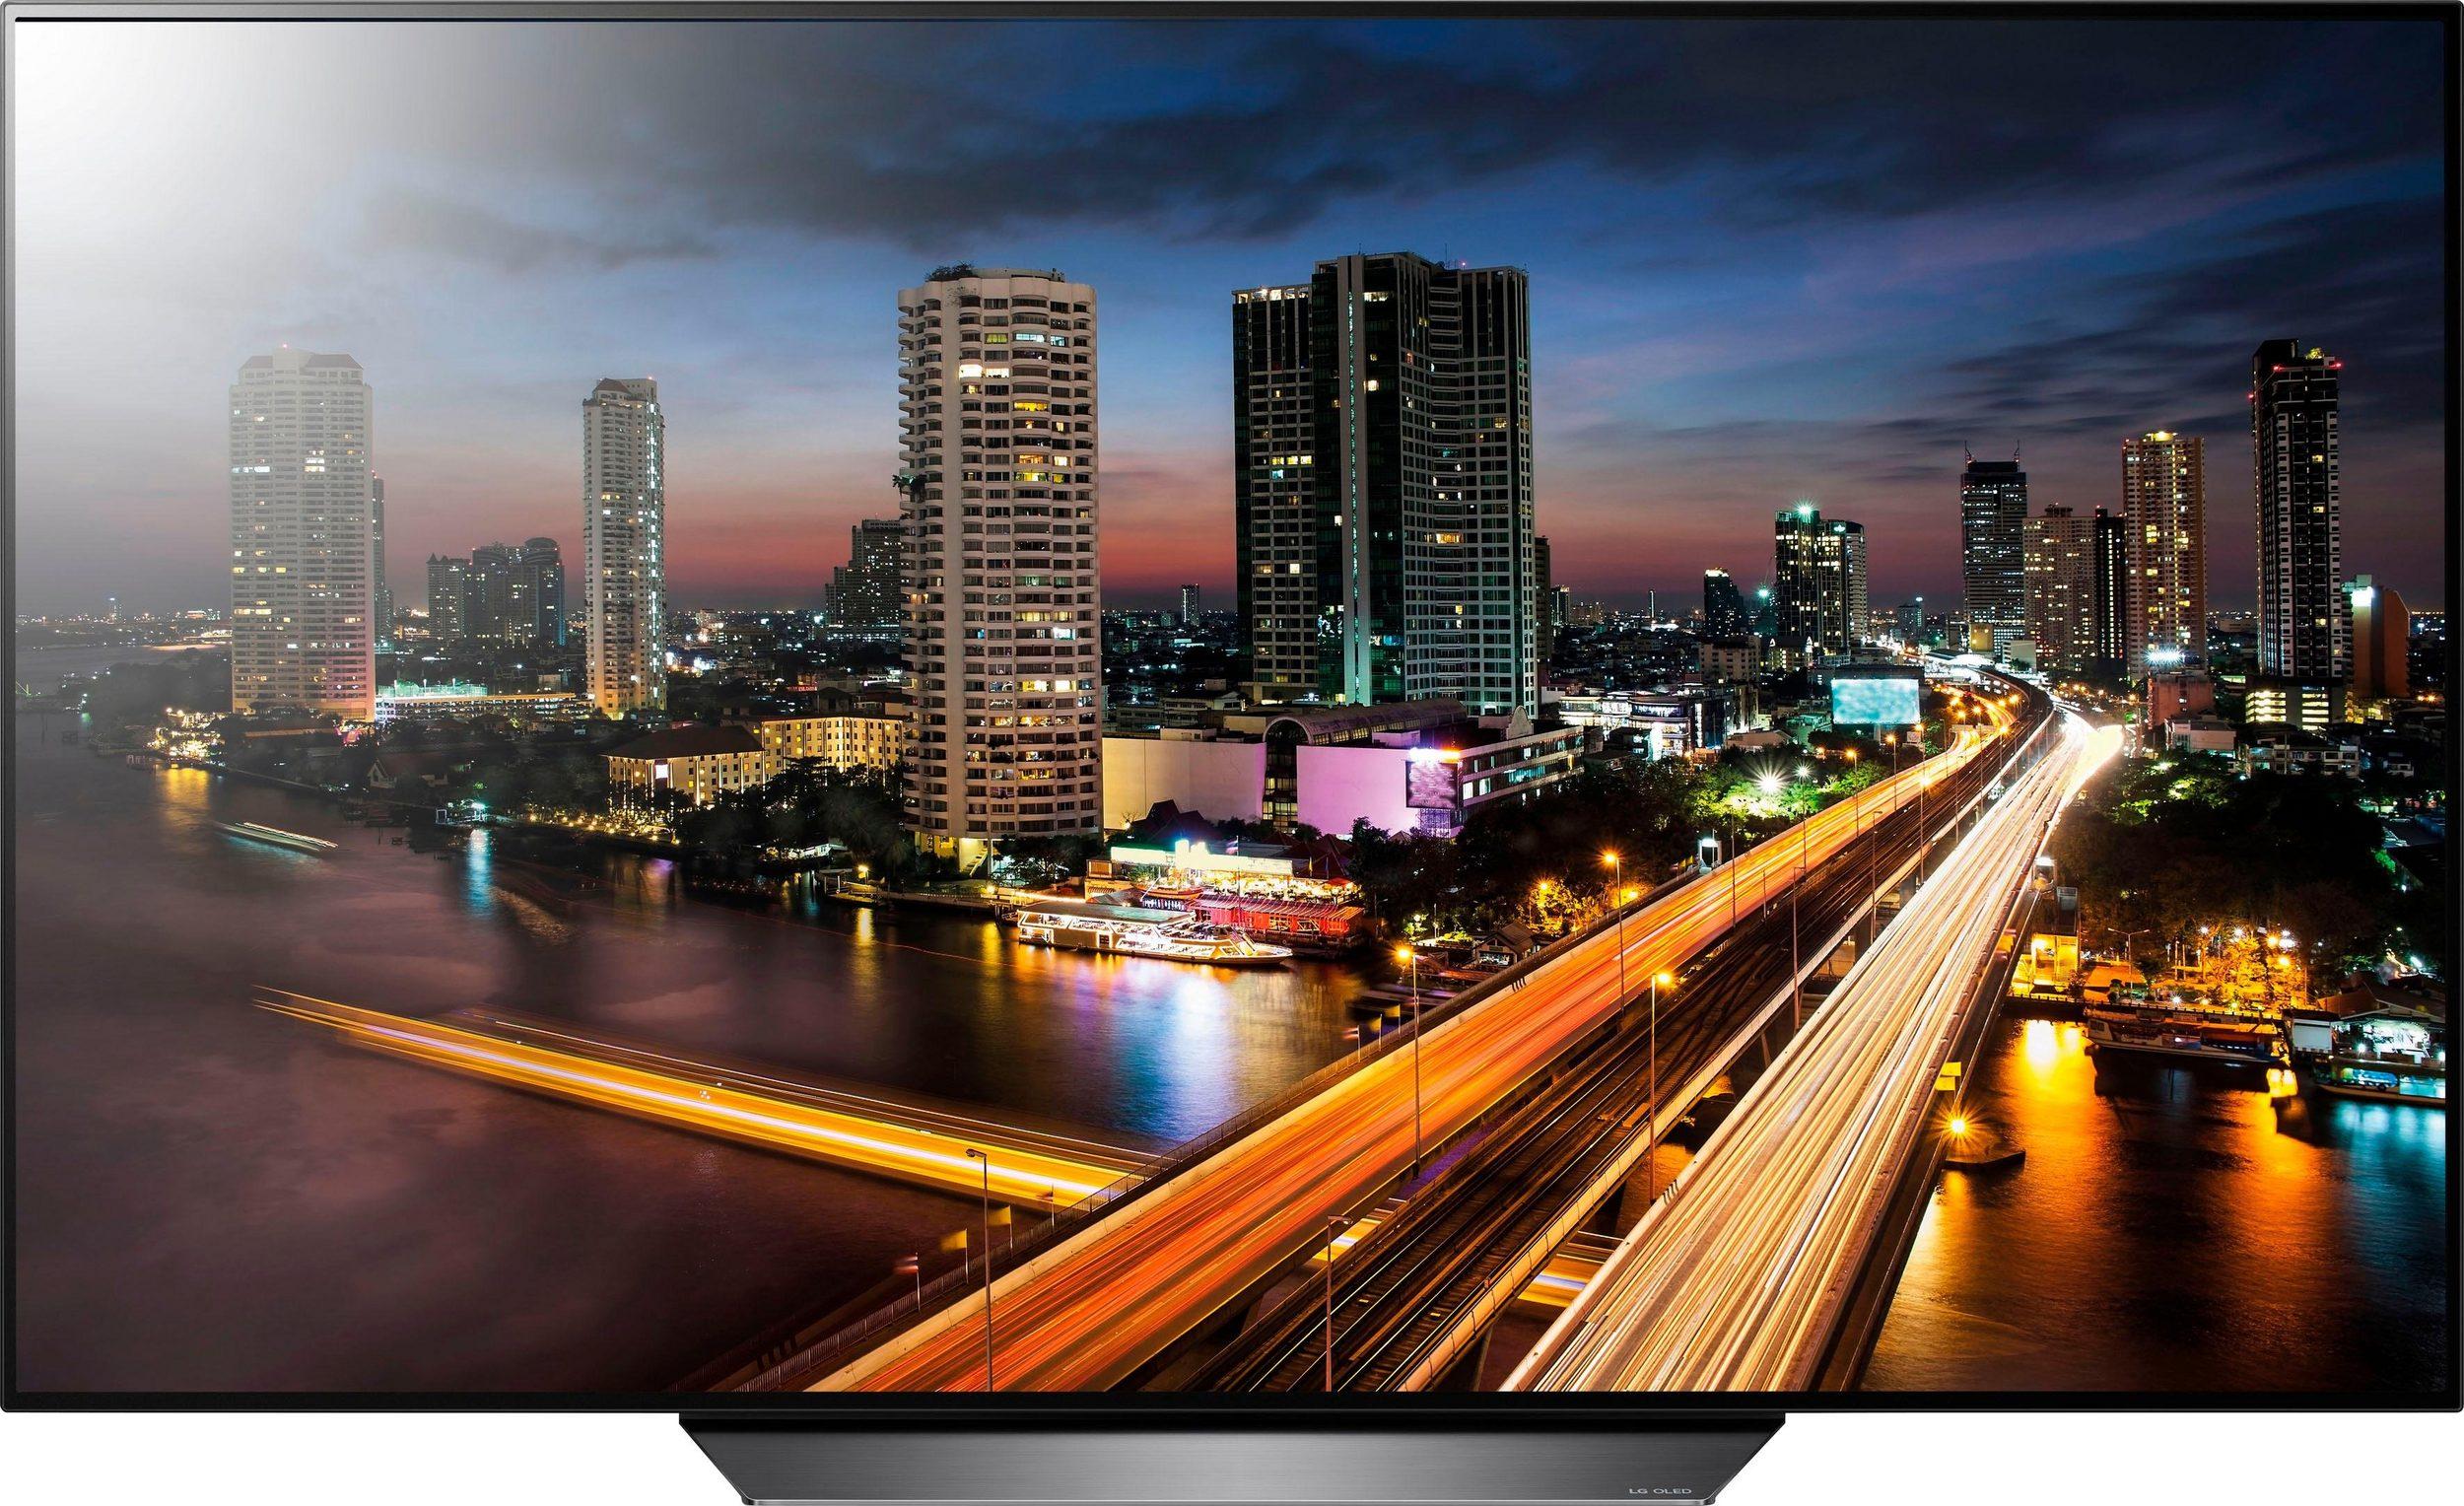 [Otto UP] 20% Rabatt auf LG Haushaltsgeräte, TV & Audio, z. B. OLED55B8LLA 55 Zoll, 4K OLED, (DVB-T2 HD/C/S2), 4x HDMI, 3x USB inkl. Versand